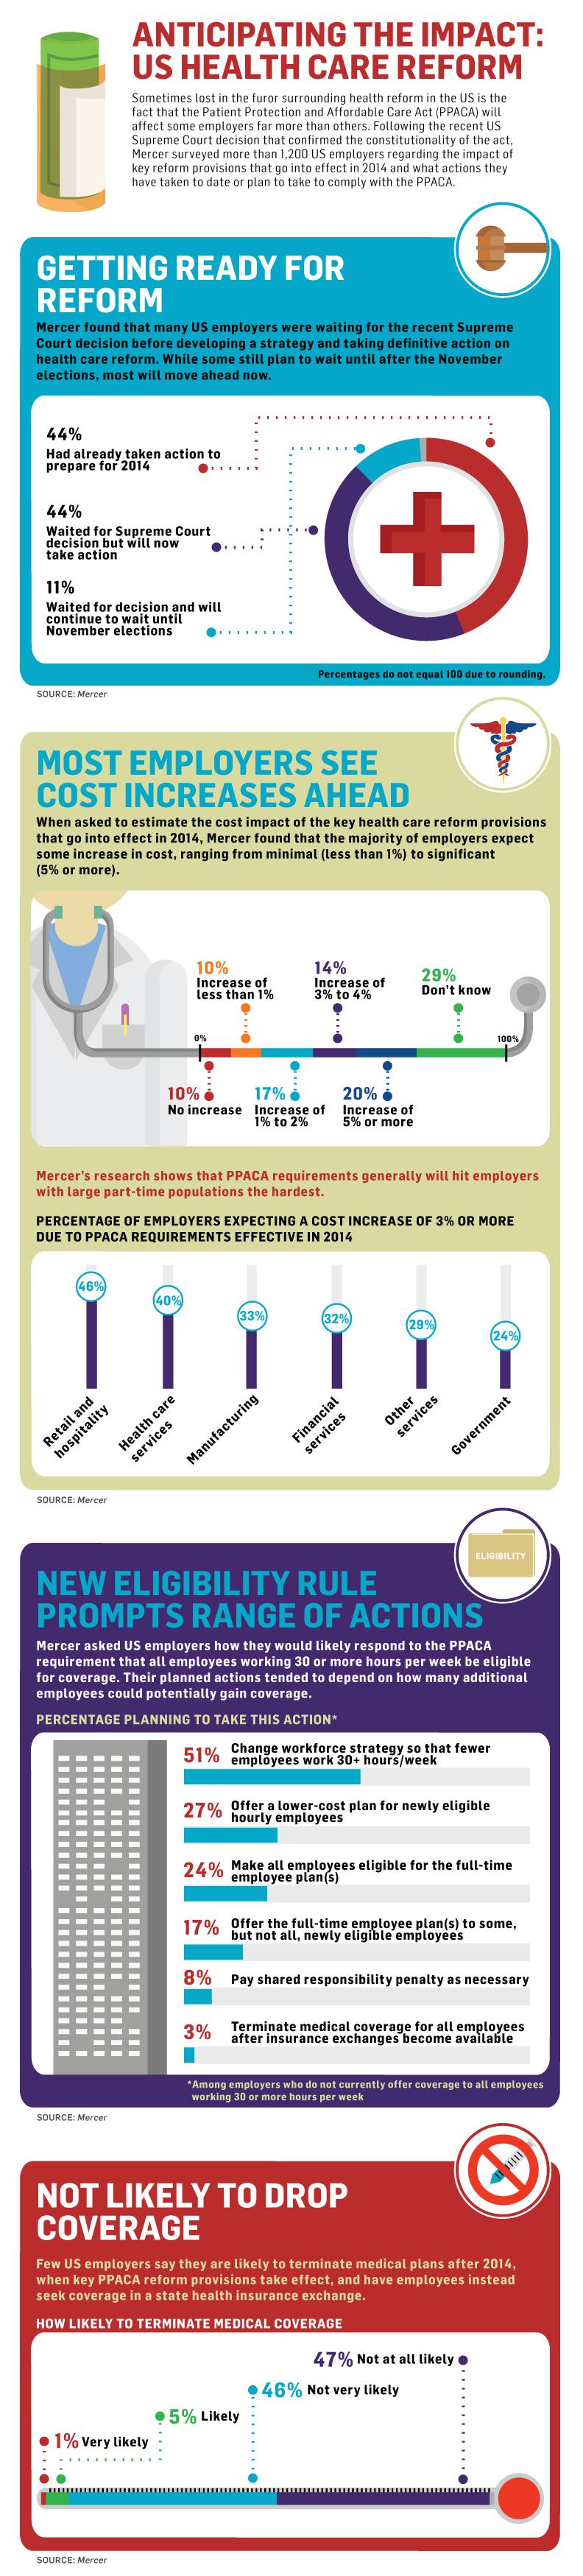 mercer survey infgraphics health care reform